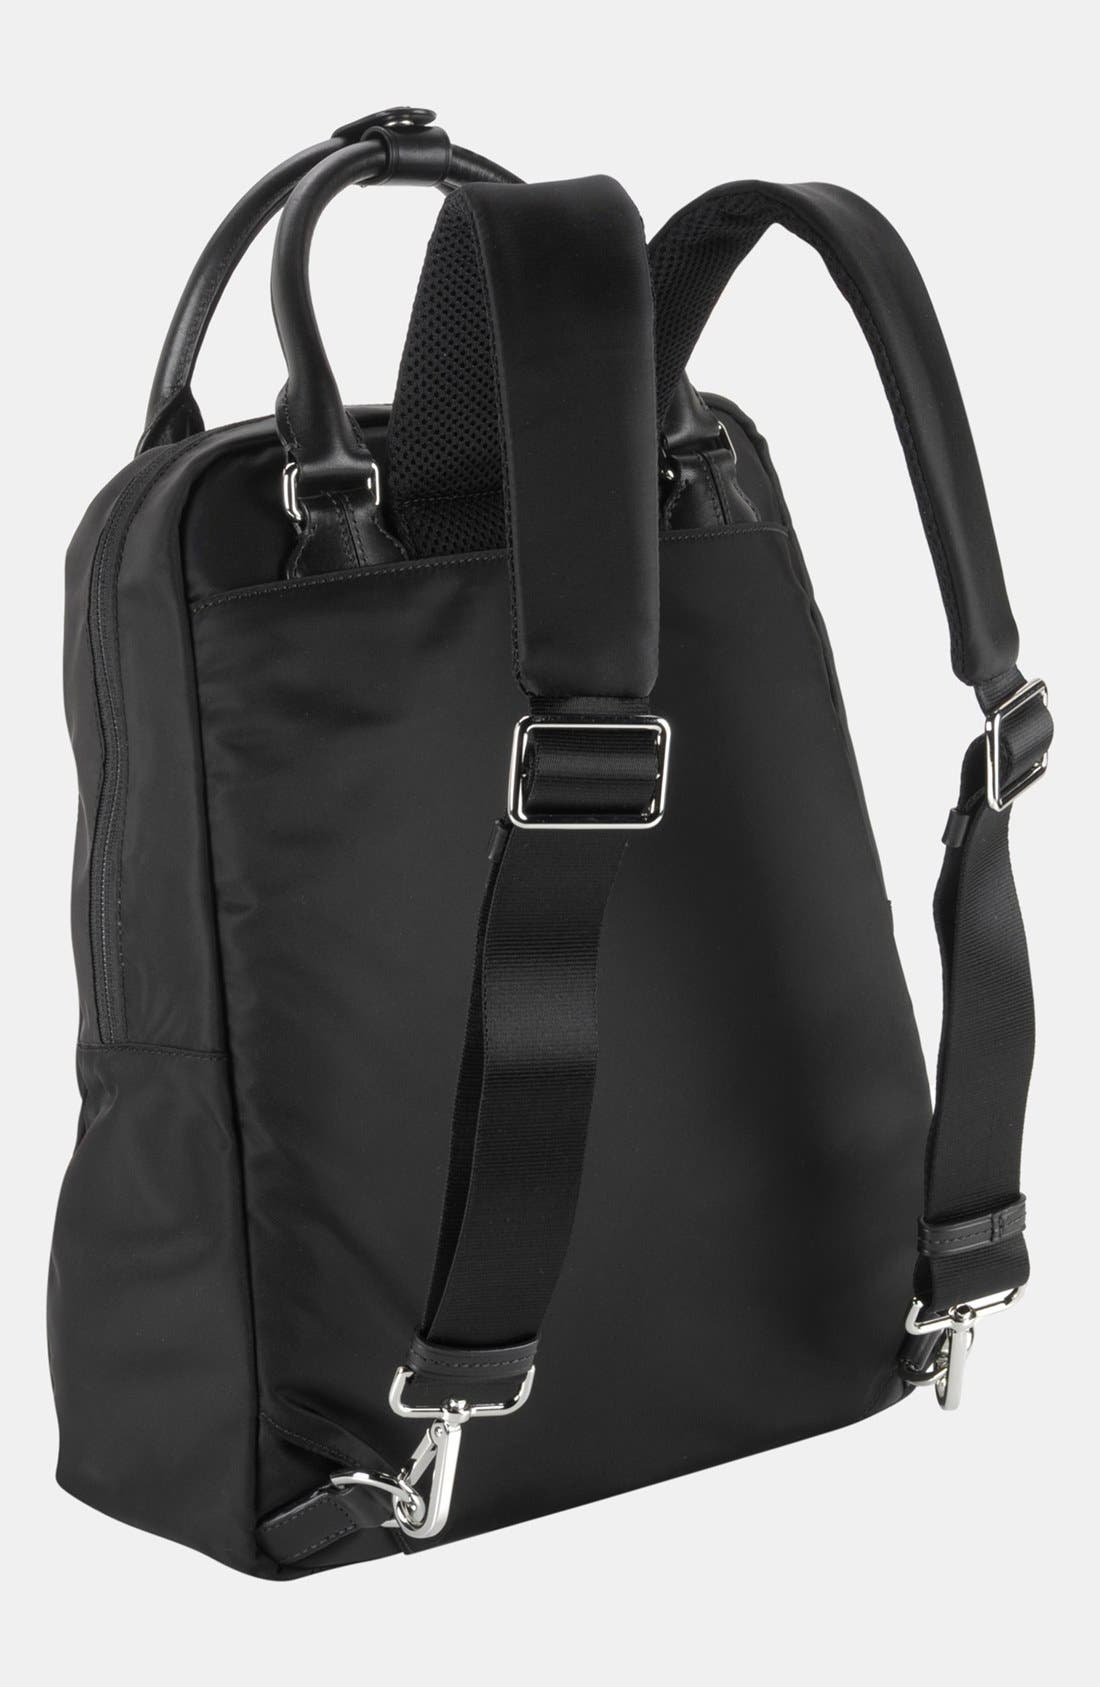 TUMI,                             'Voyager - Ascot' Convertible Backpack,                             Alternate thumbnail 2, color,                             001